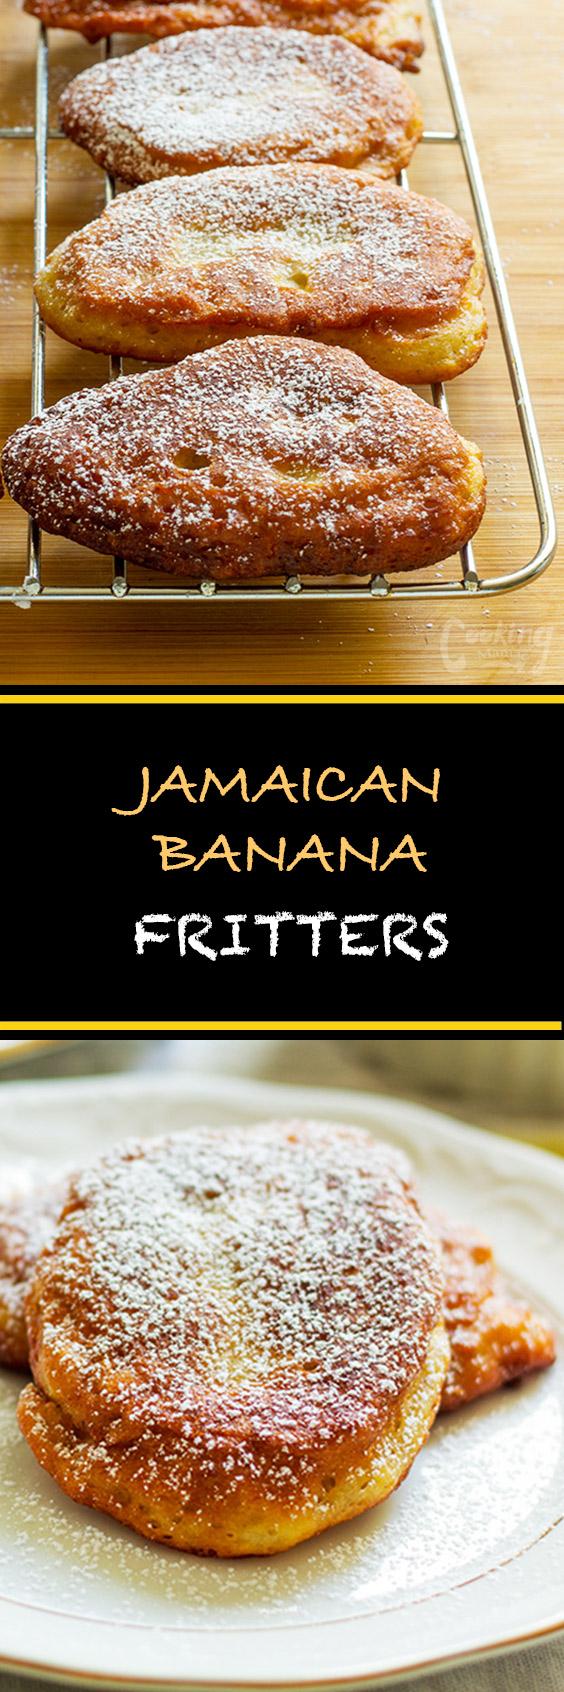 JAMAICAN_BANANA-FRITTERS